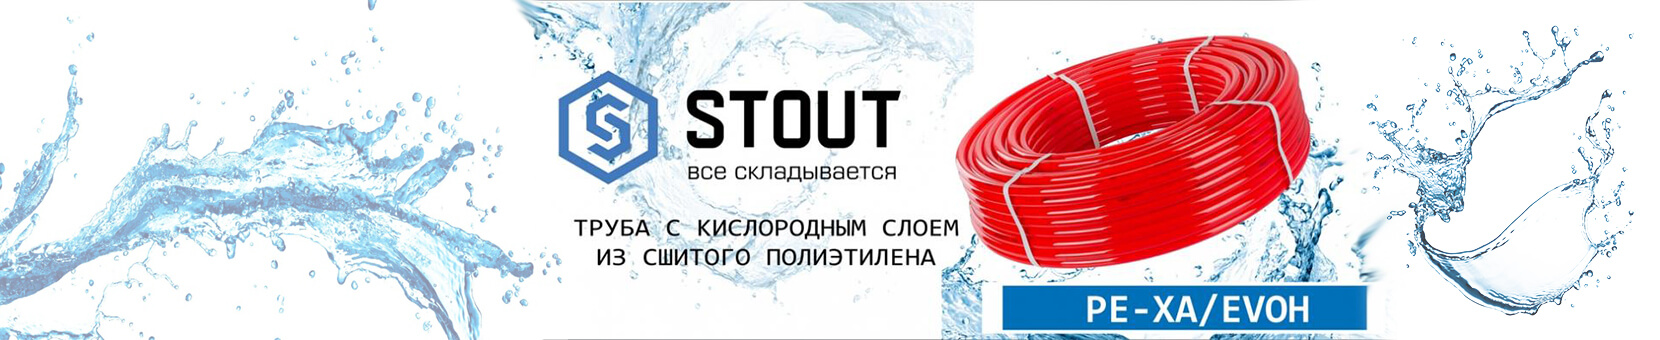 Котлы Краснодар - KotLow.ru котлы, трубы, радиаторы в Краснодаре